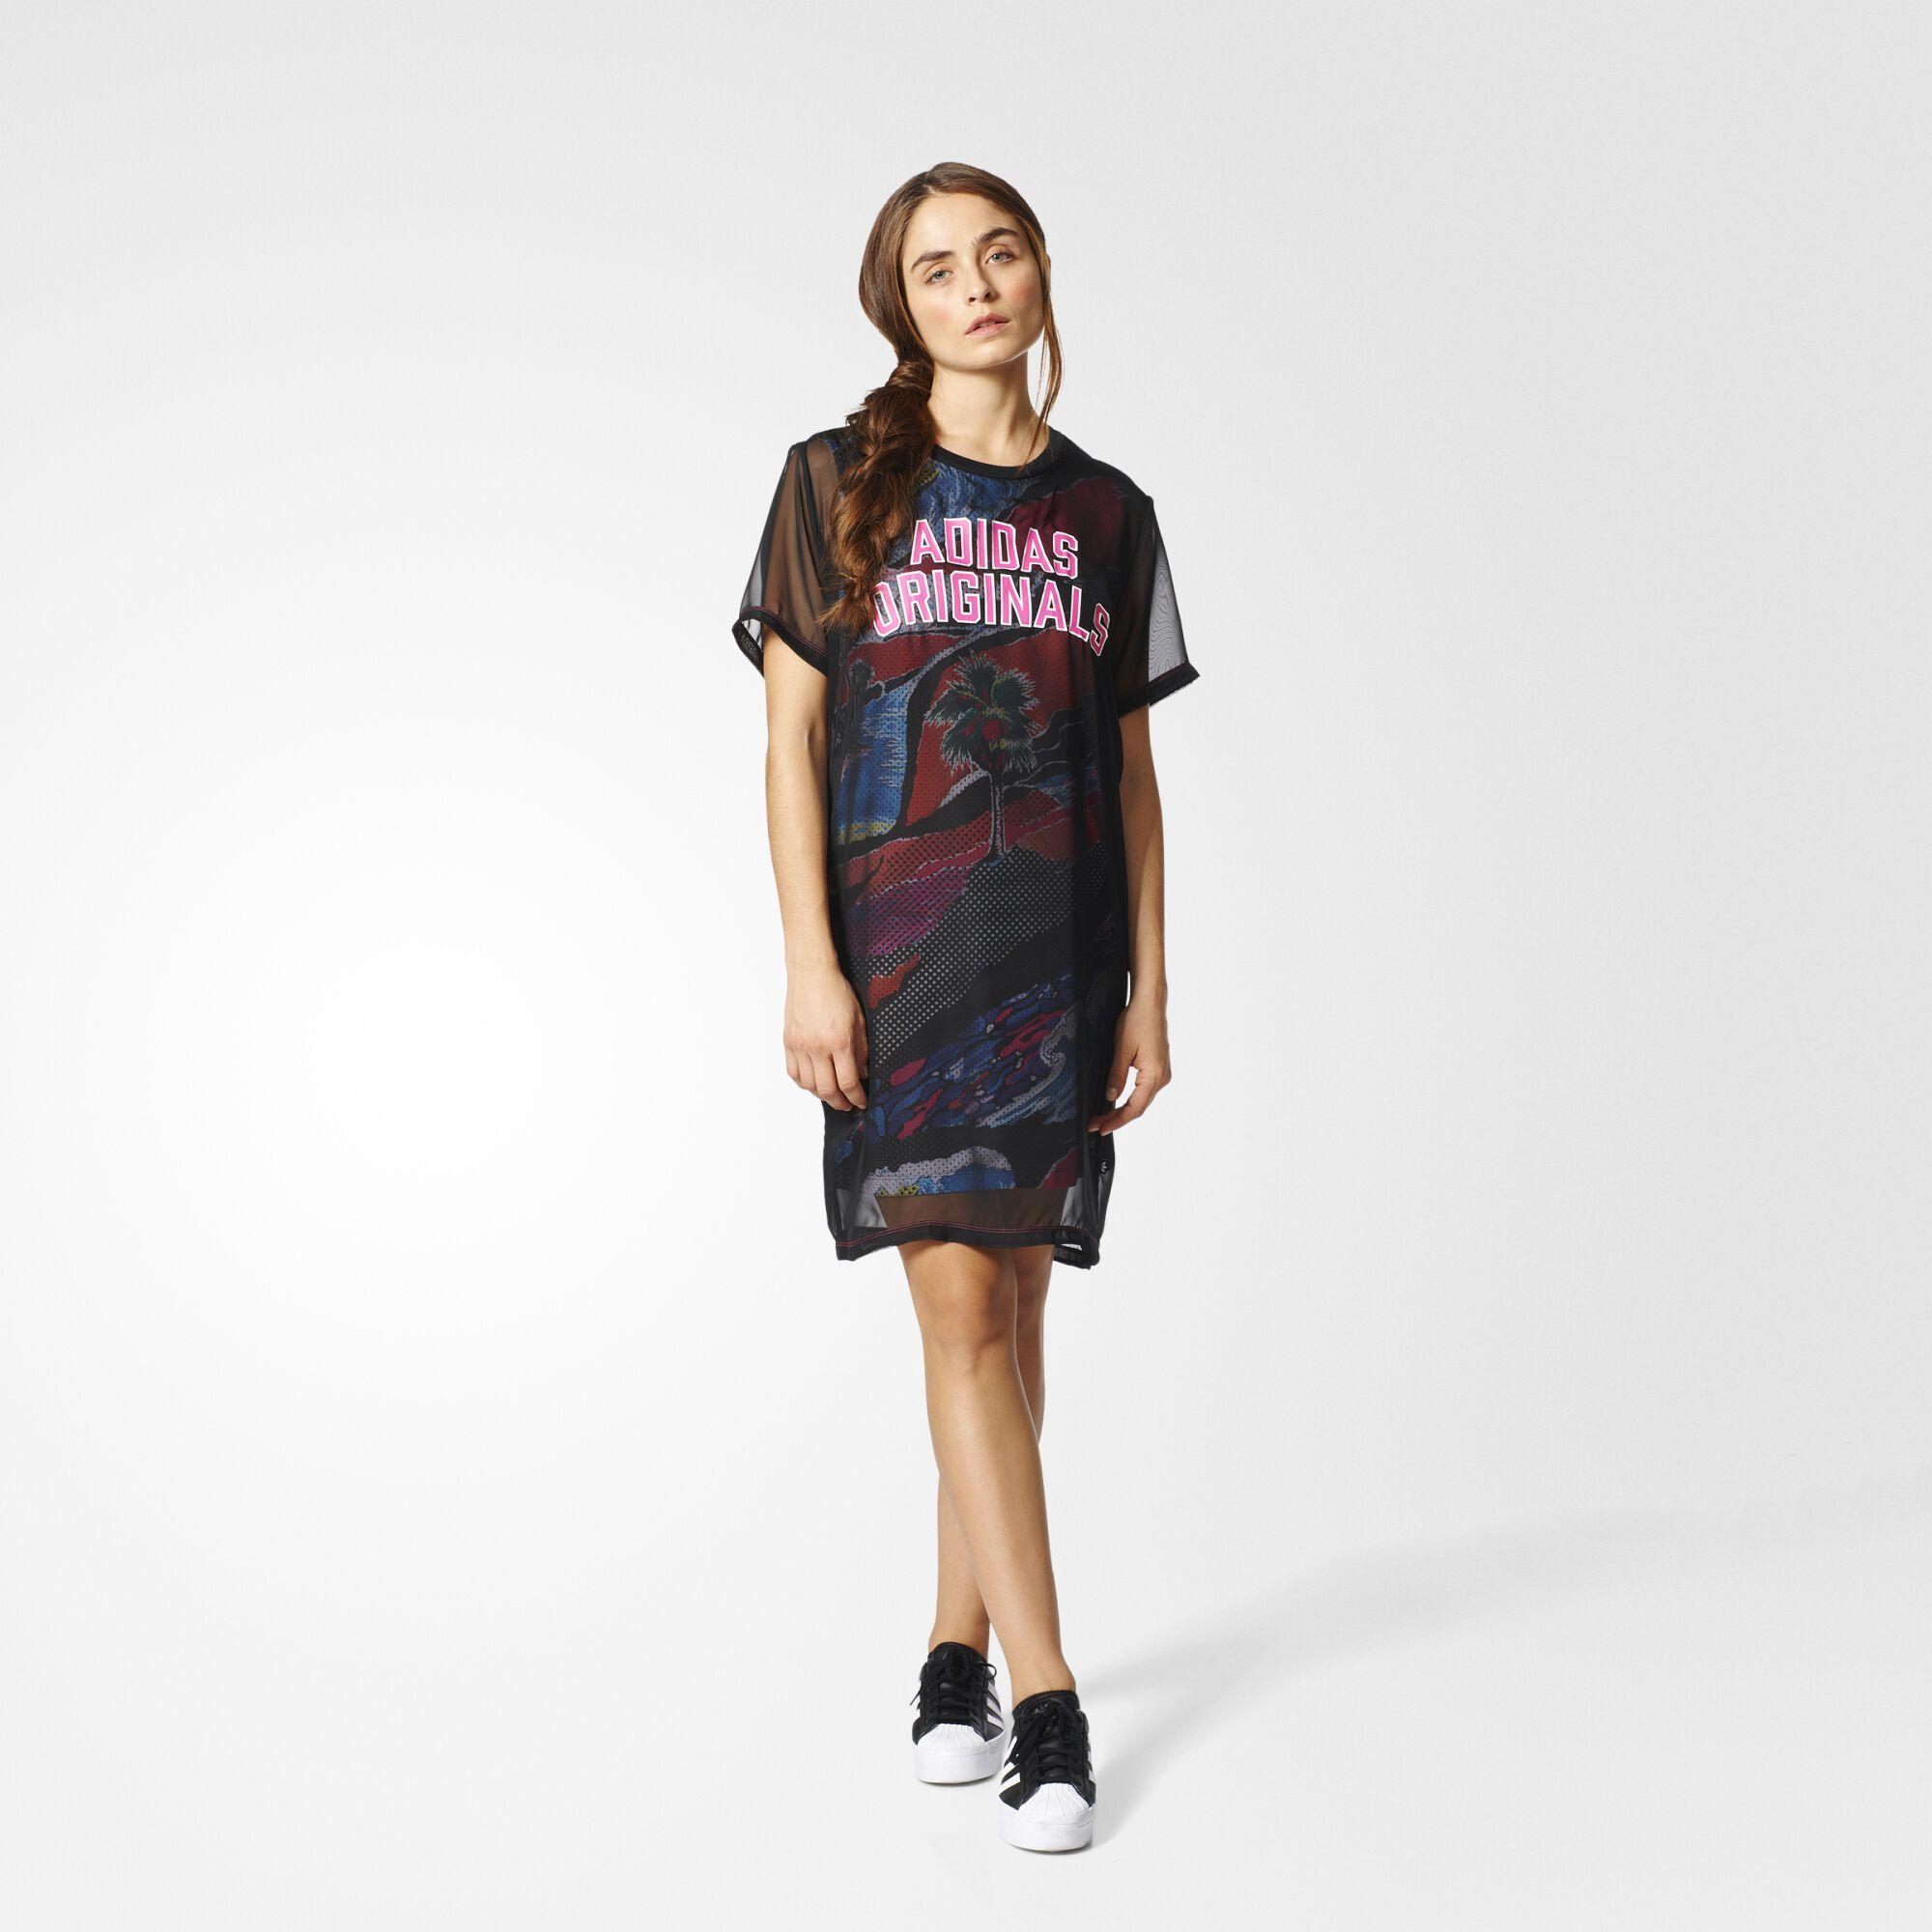 Black dress size 4 adidas